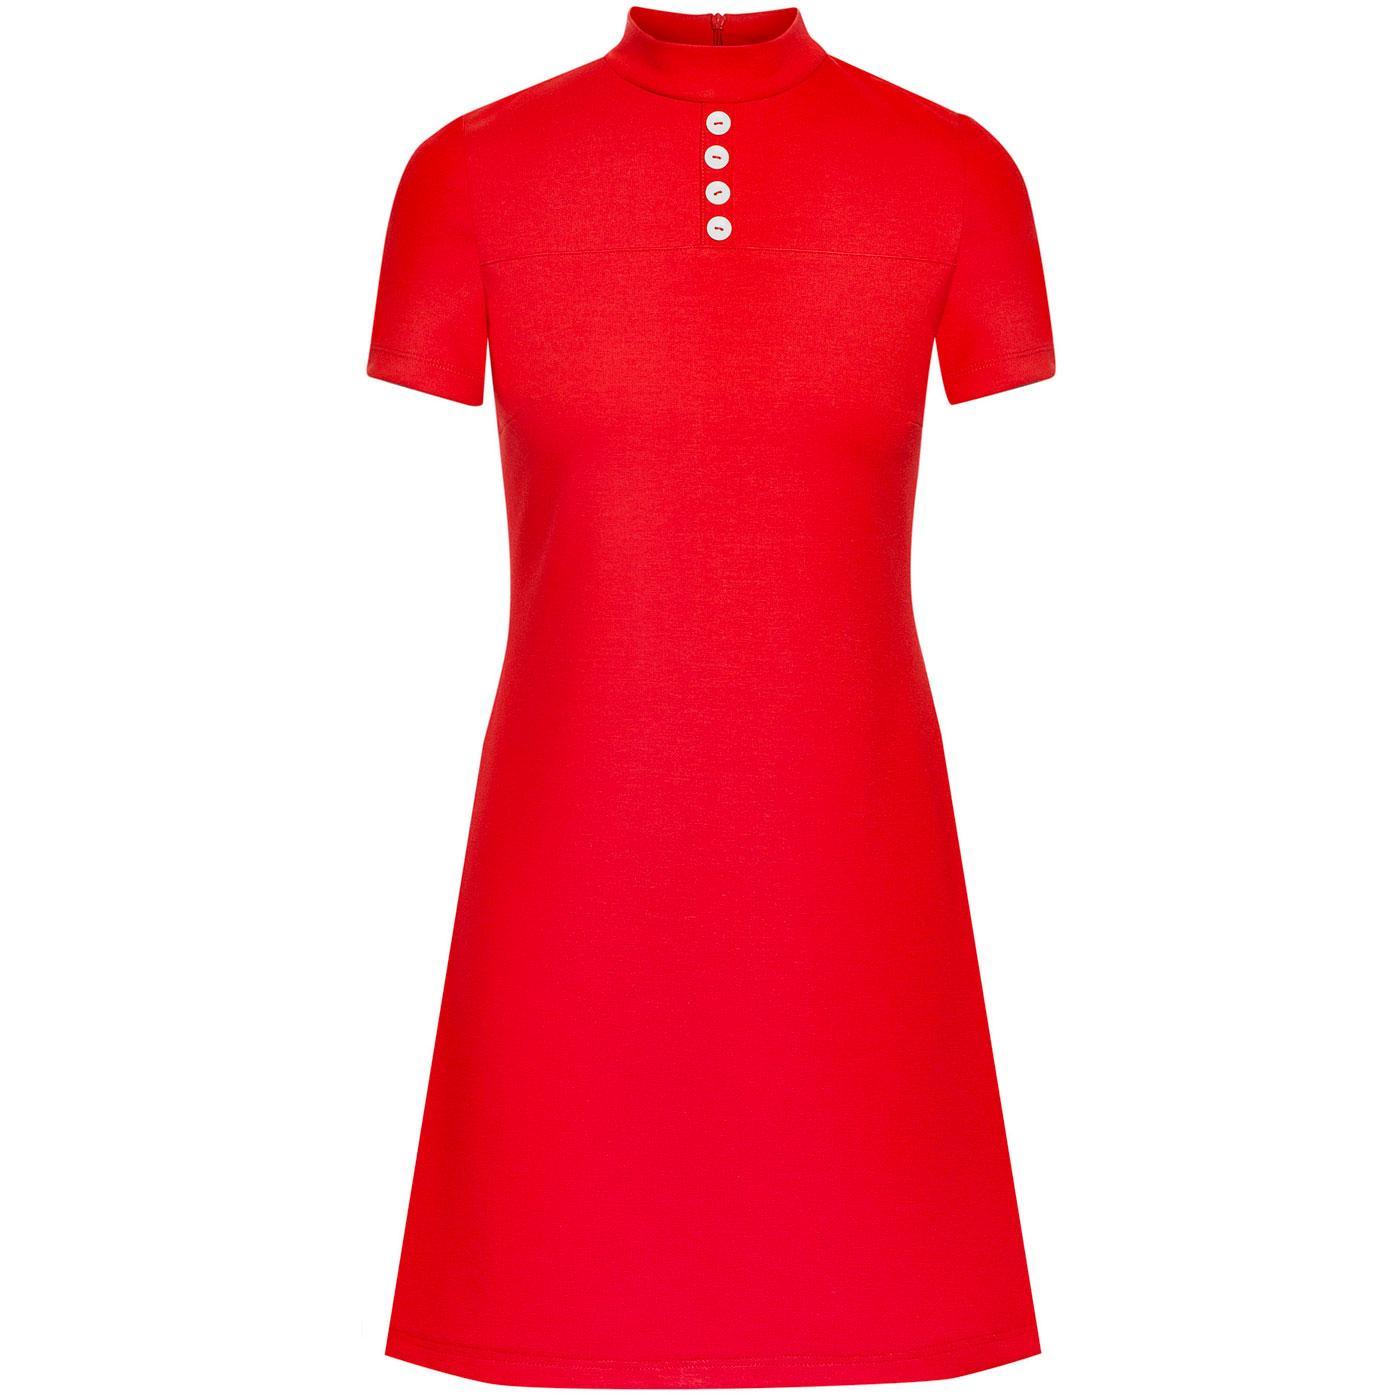 Pure Joy MADEMOISELLE YEYE 1960s Mod Dress (Red)